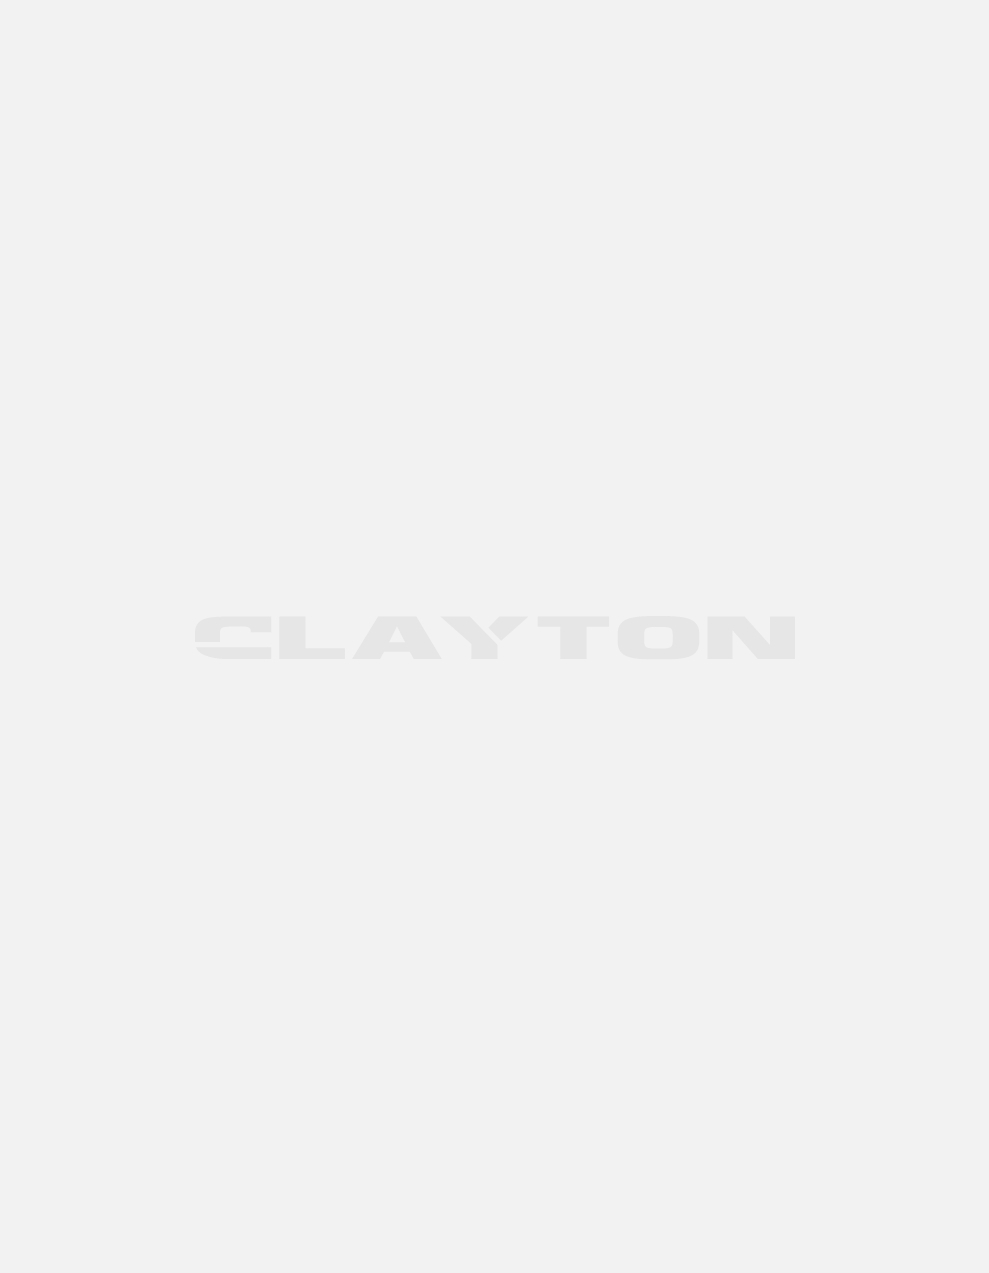 https://www.claytonitalia.com/media/catalog/product/cache/5/small_image/460x590/9df78eab33525d08d6e5fb8d27136e95/g/i/gift57_nt.jpg